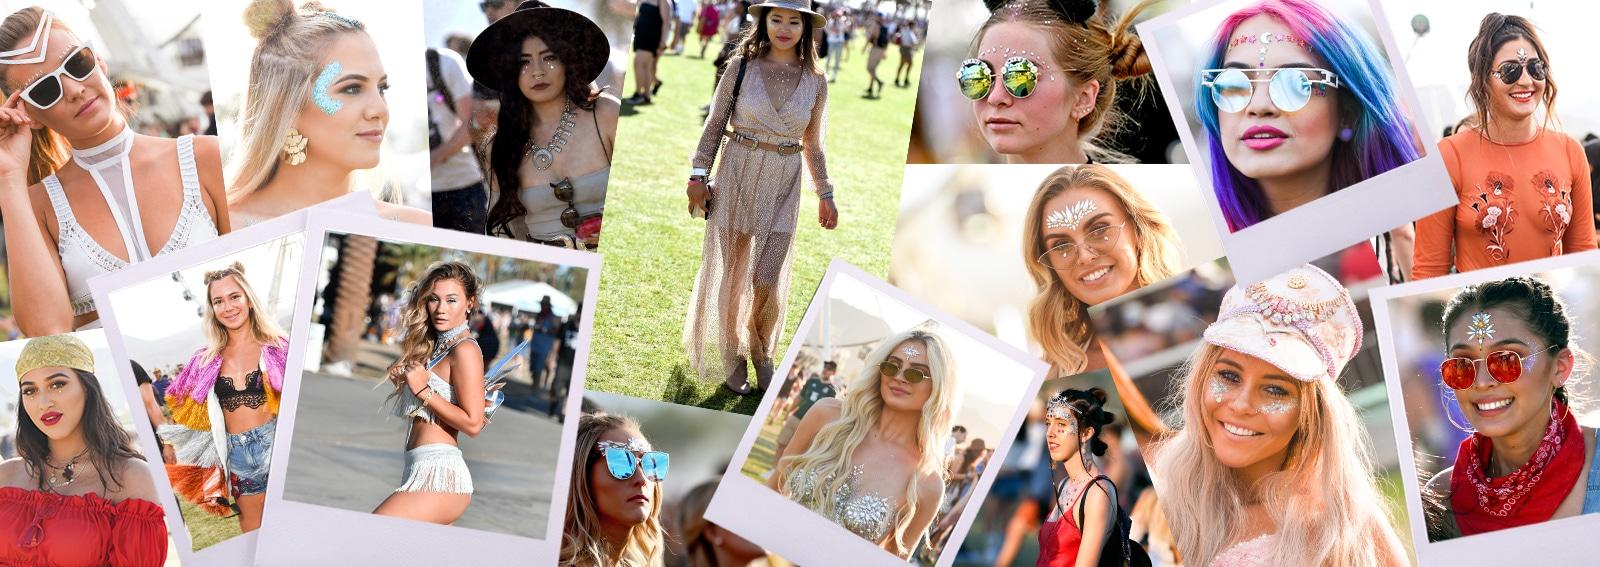 DESKTOP_beauty_jewel_make_up_da_festival